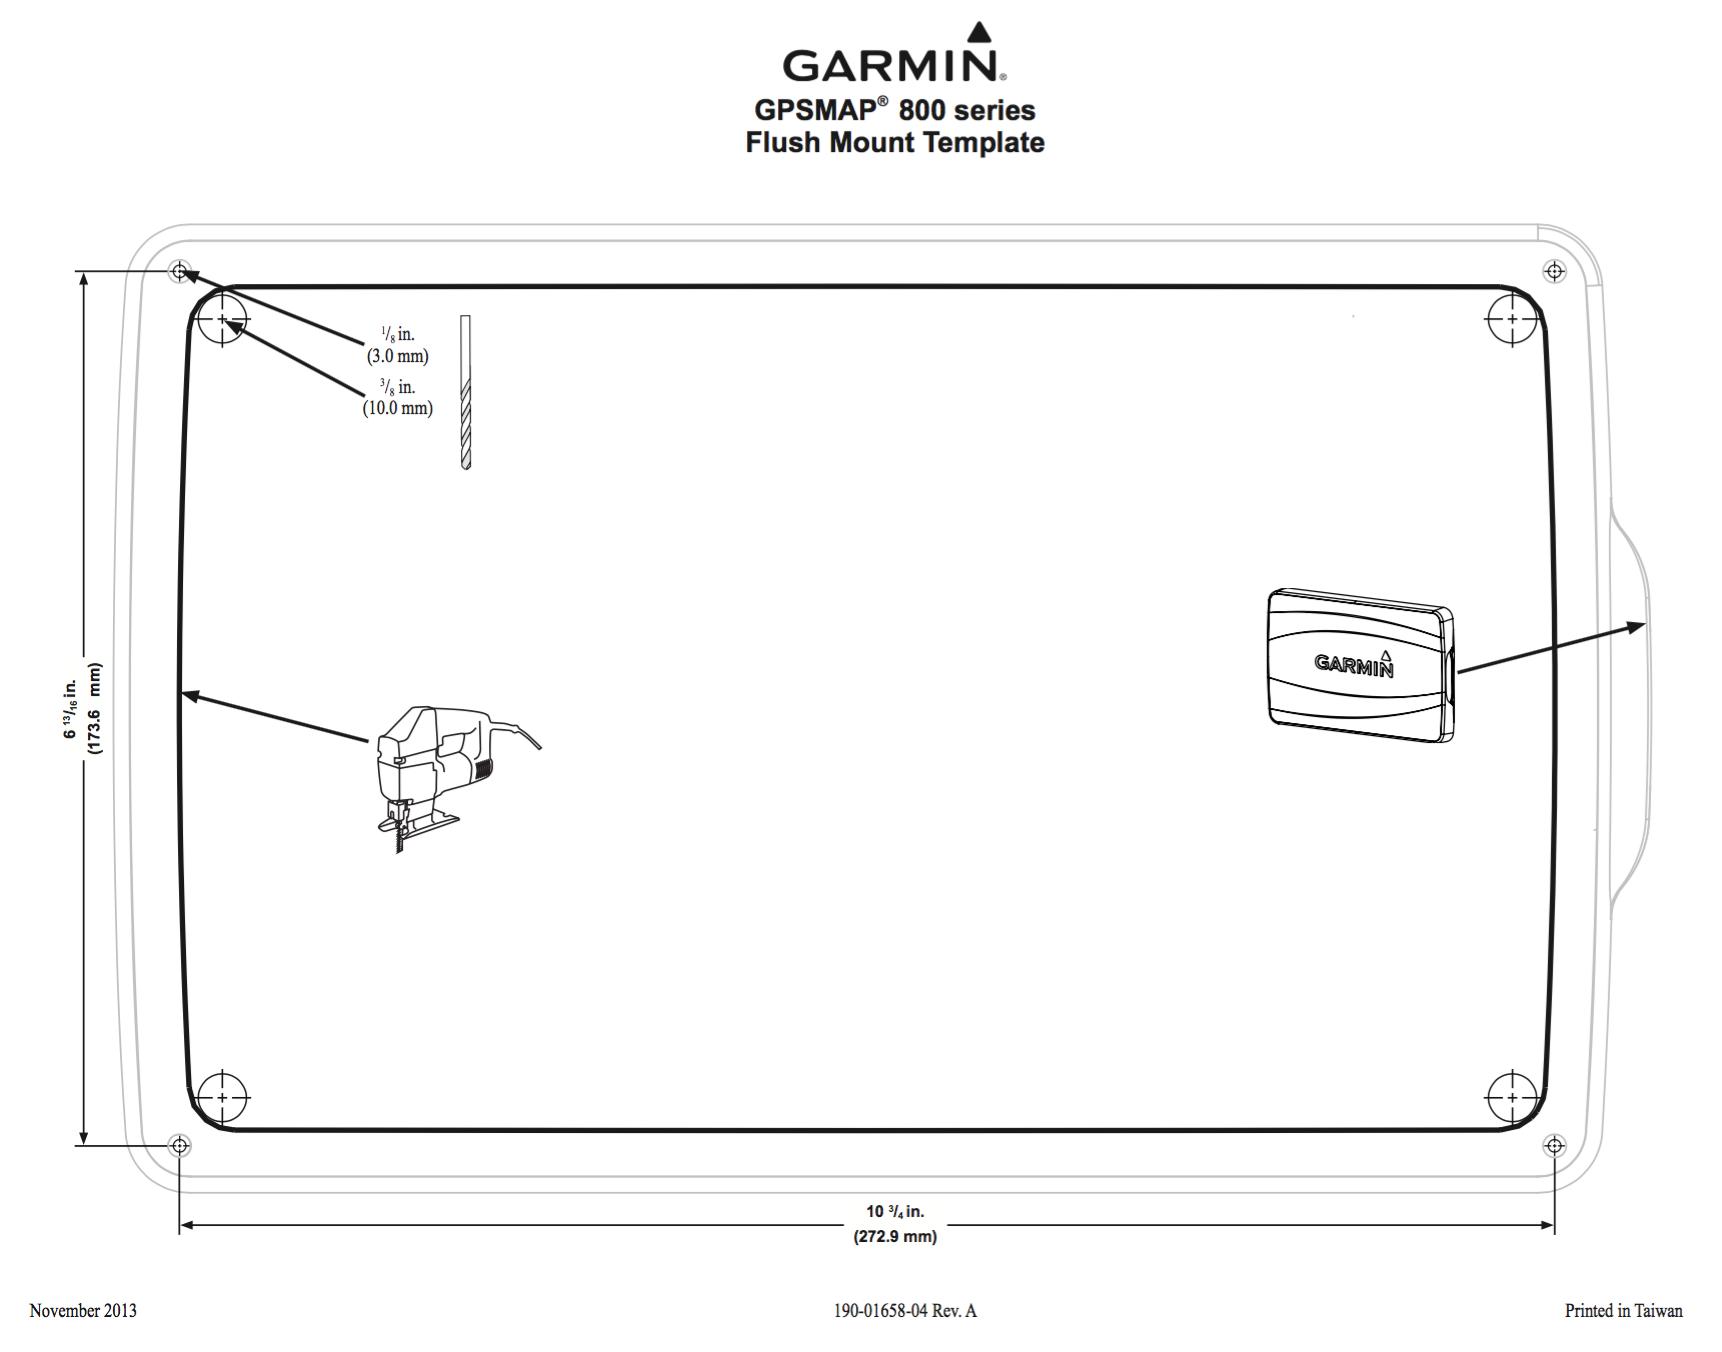 gpsmap 800 mounting template